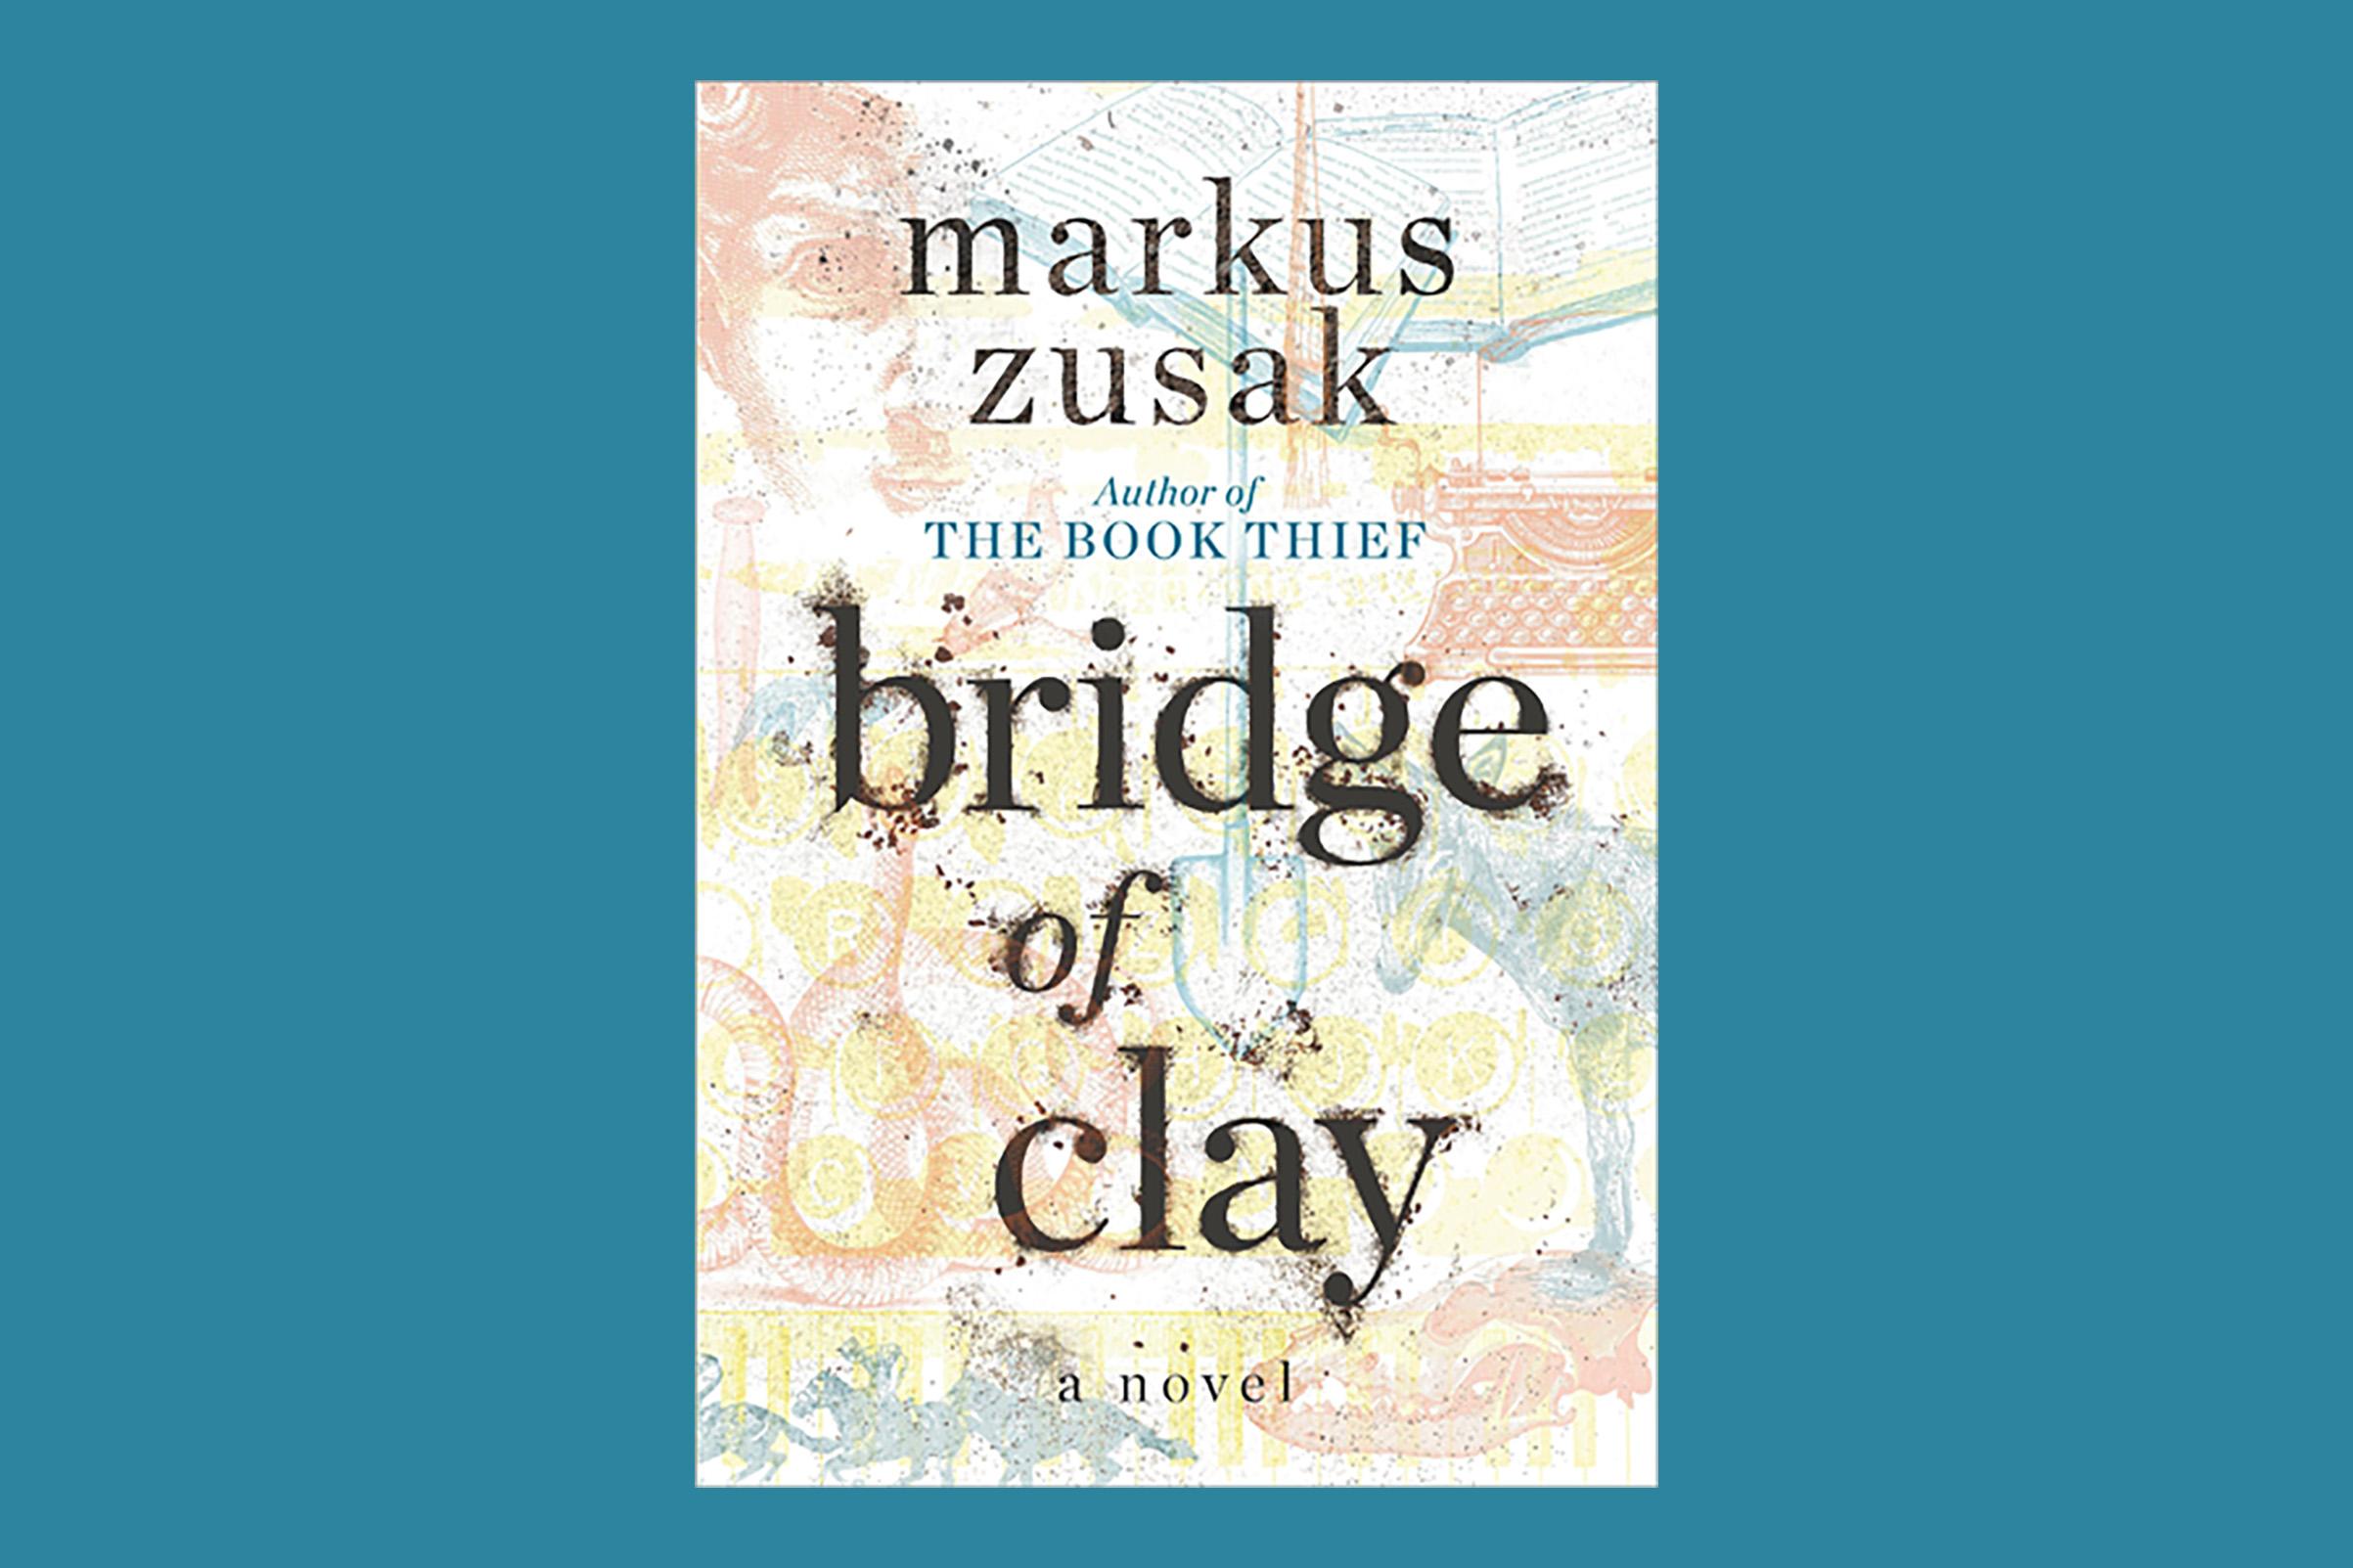 Book Thief author Markus Zusak's new novel, Bridge of Clay